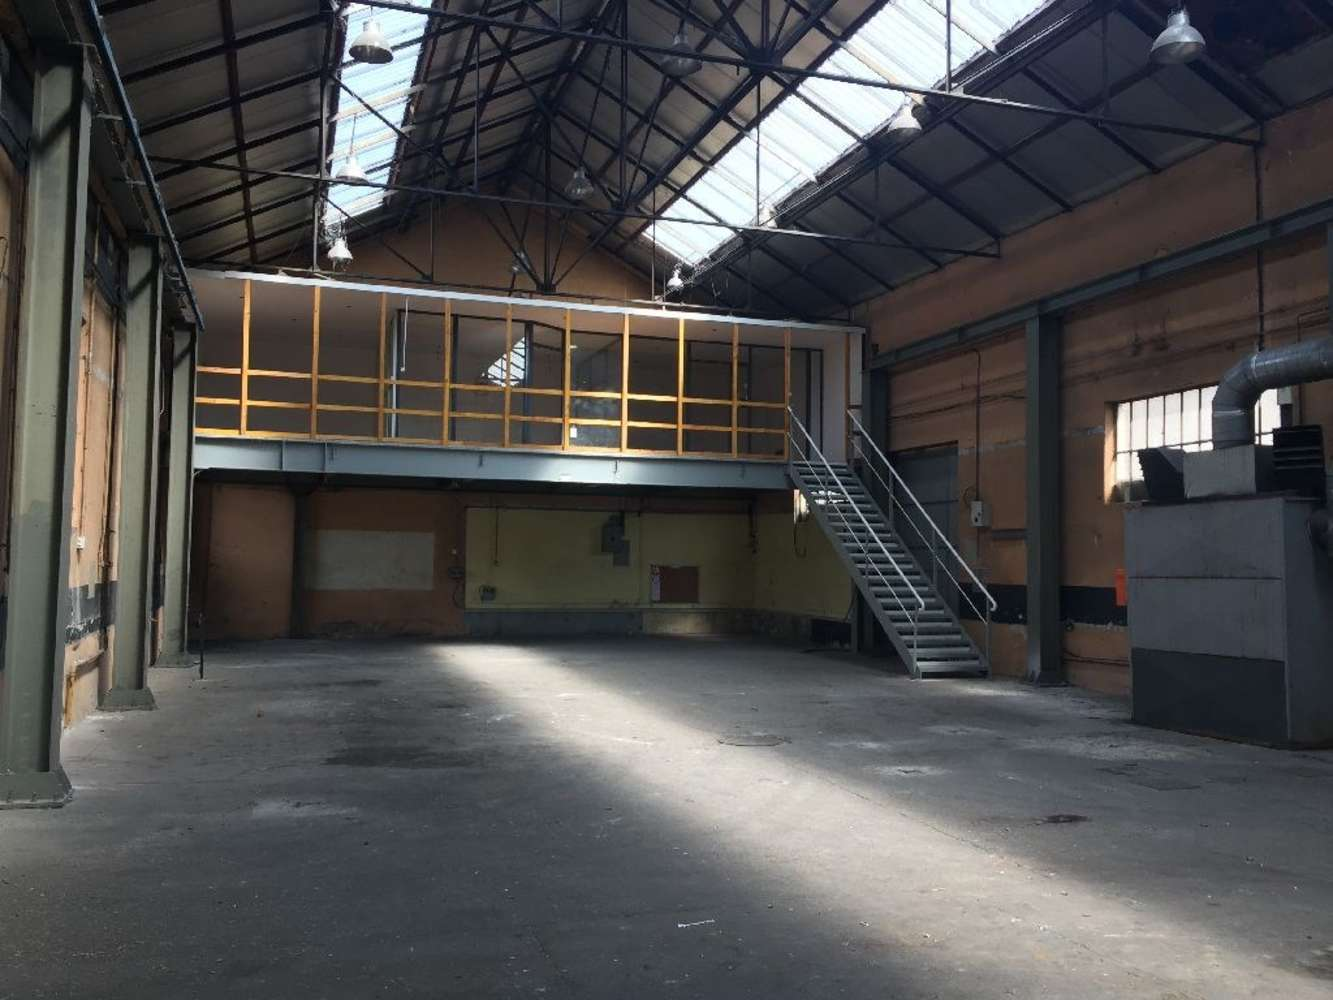 Activités/entrepôt Villeurbanne, 69100 - Location entrepot Villeurbanne (Lyon) - 9579216